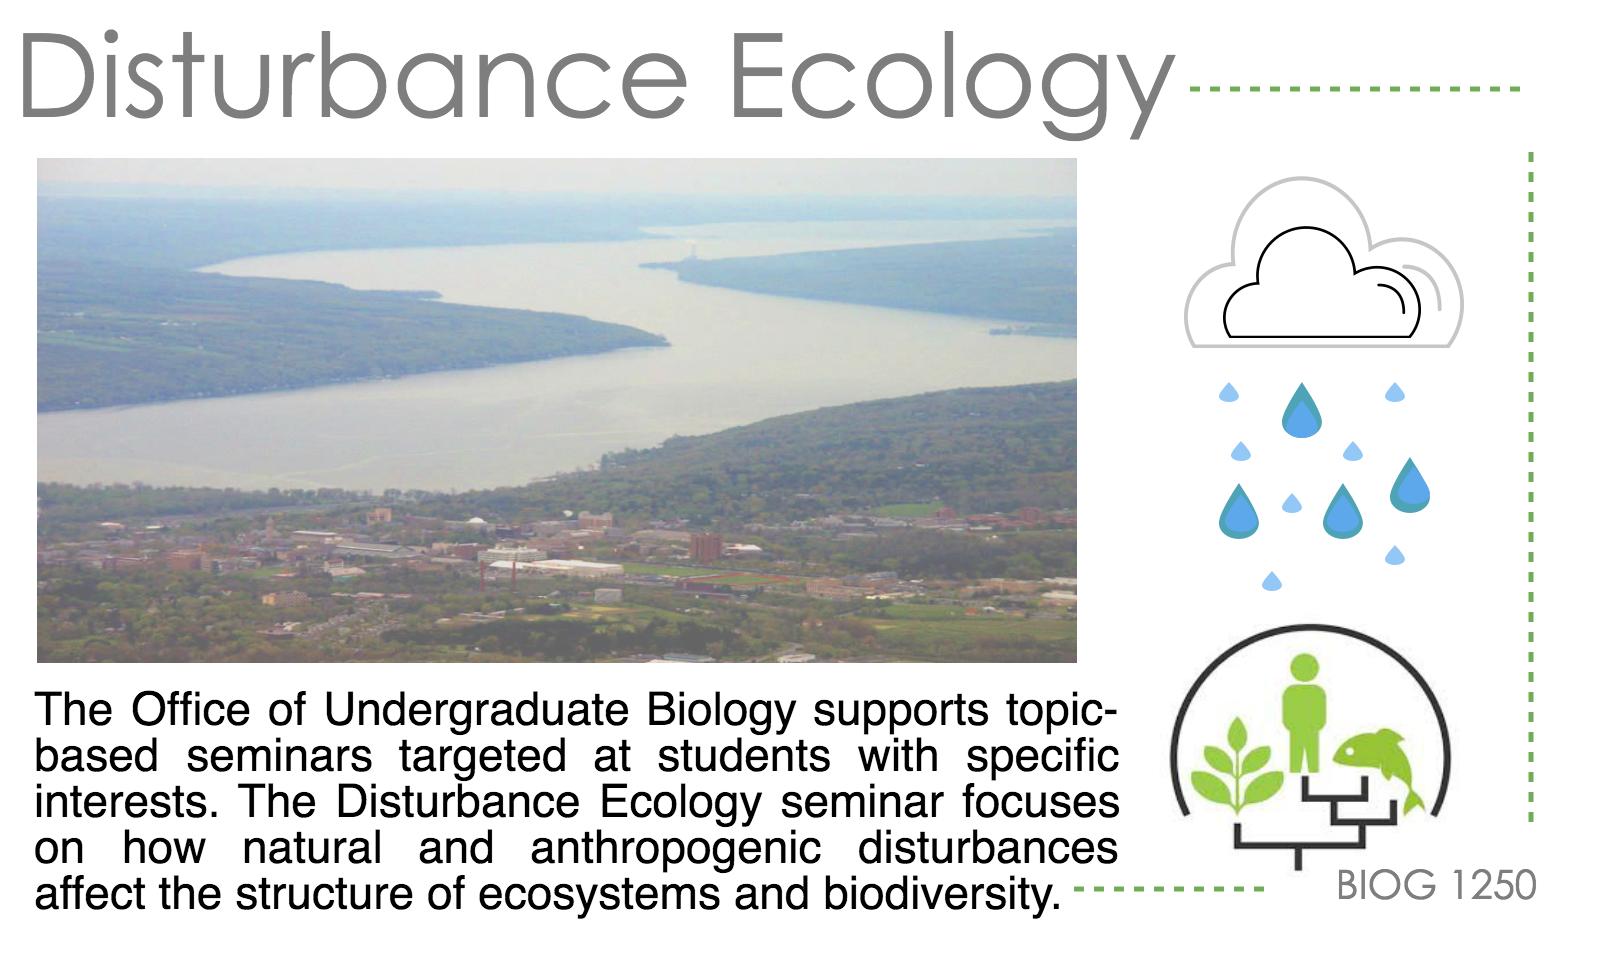 Disturbance Ecology seminar